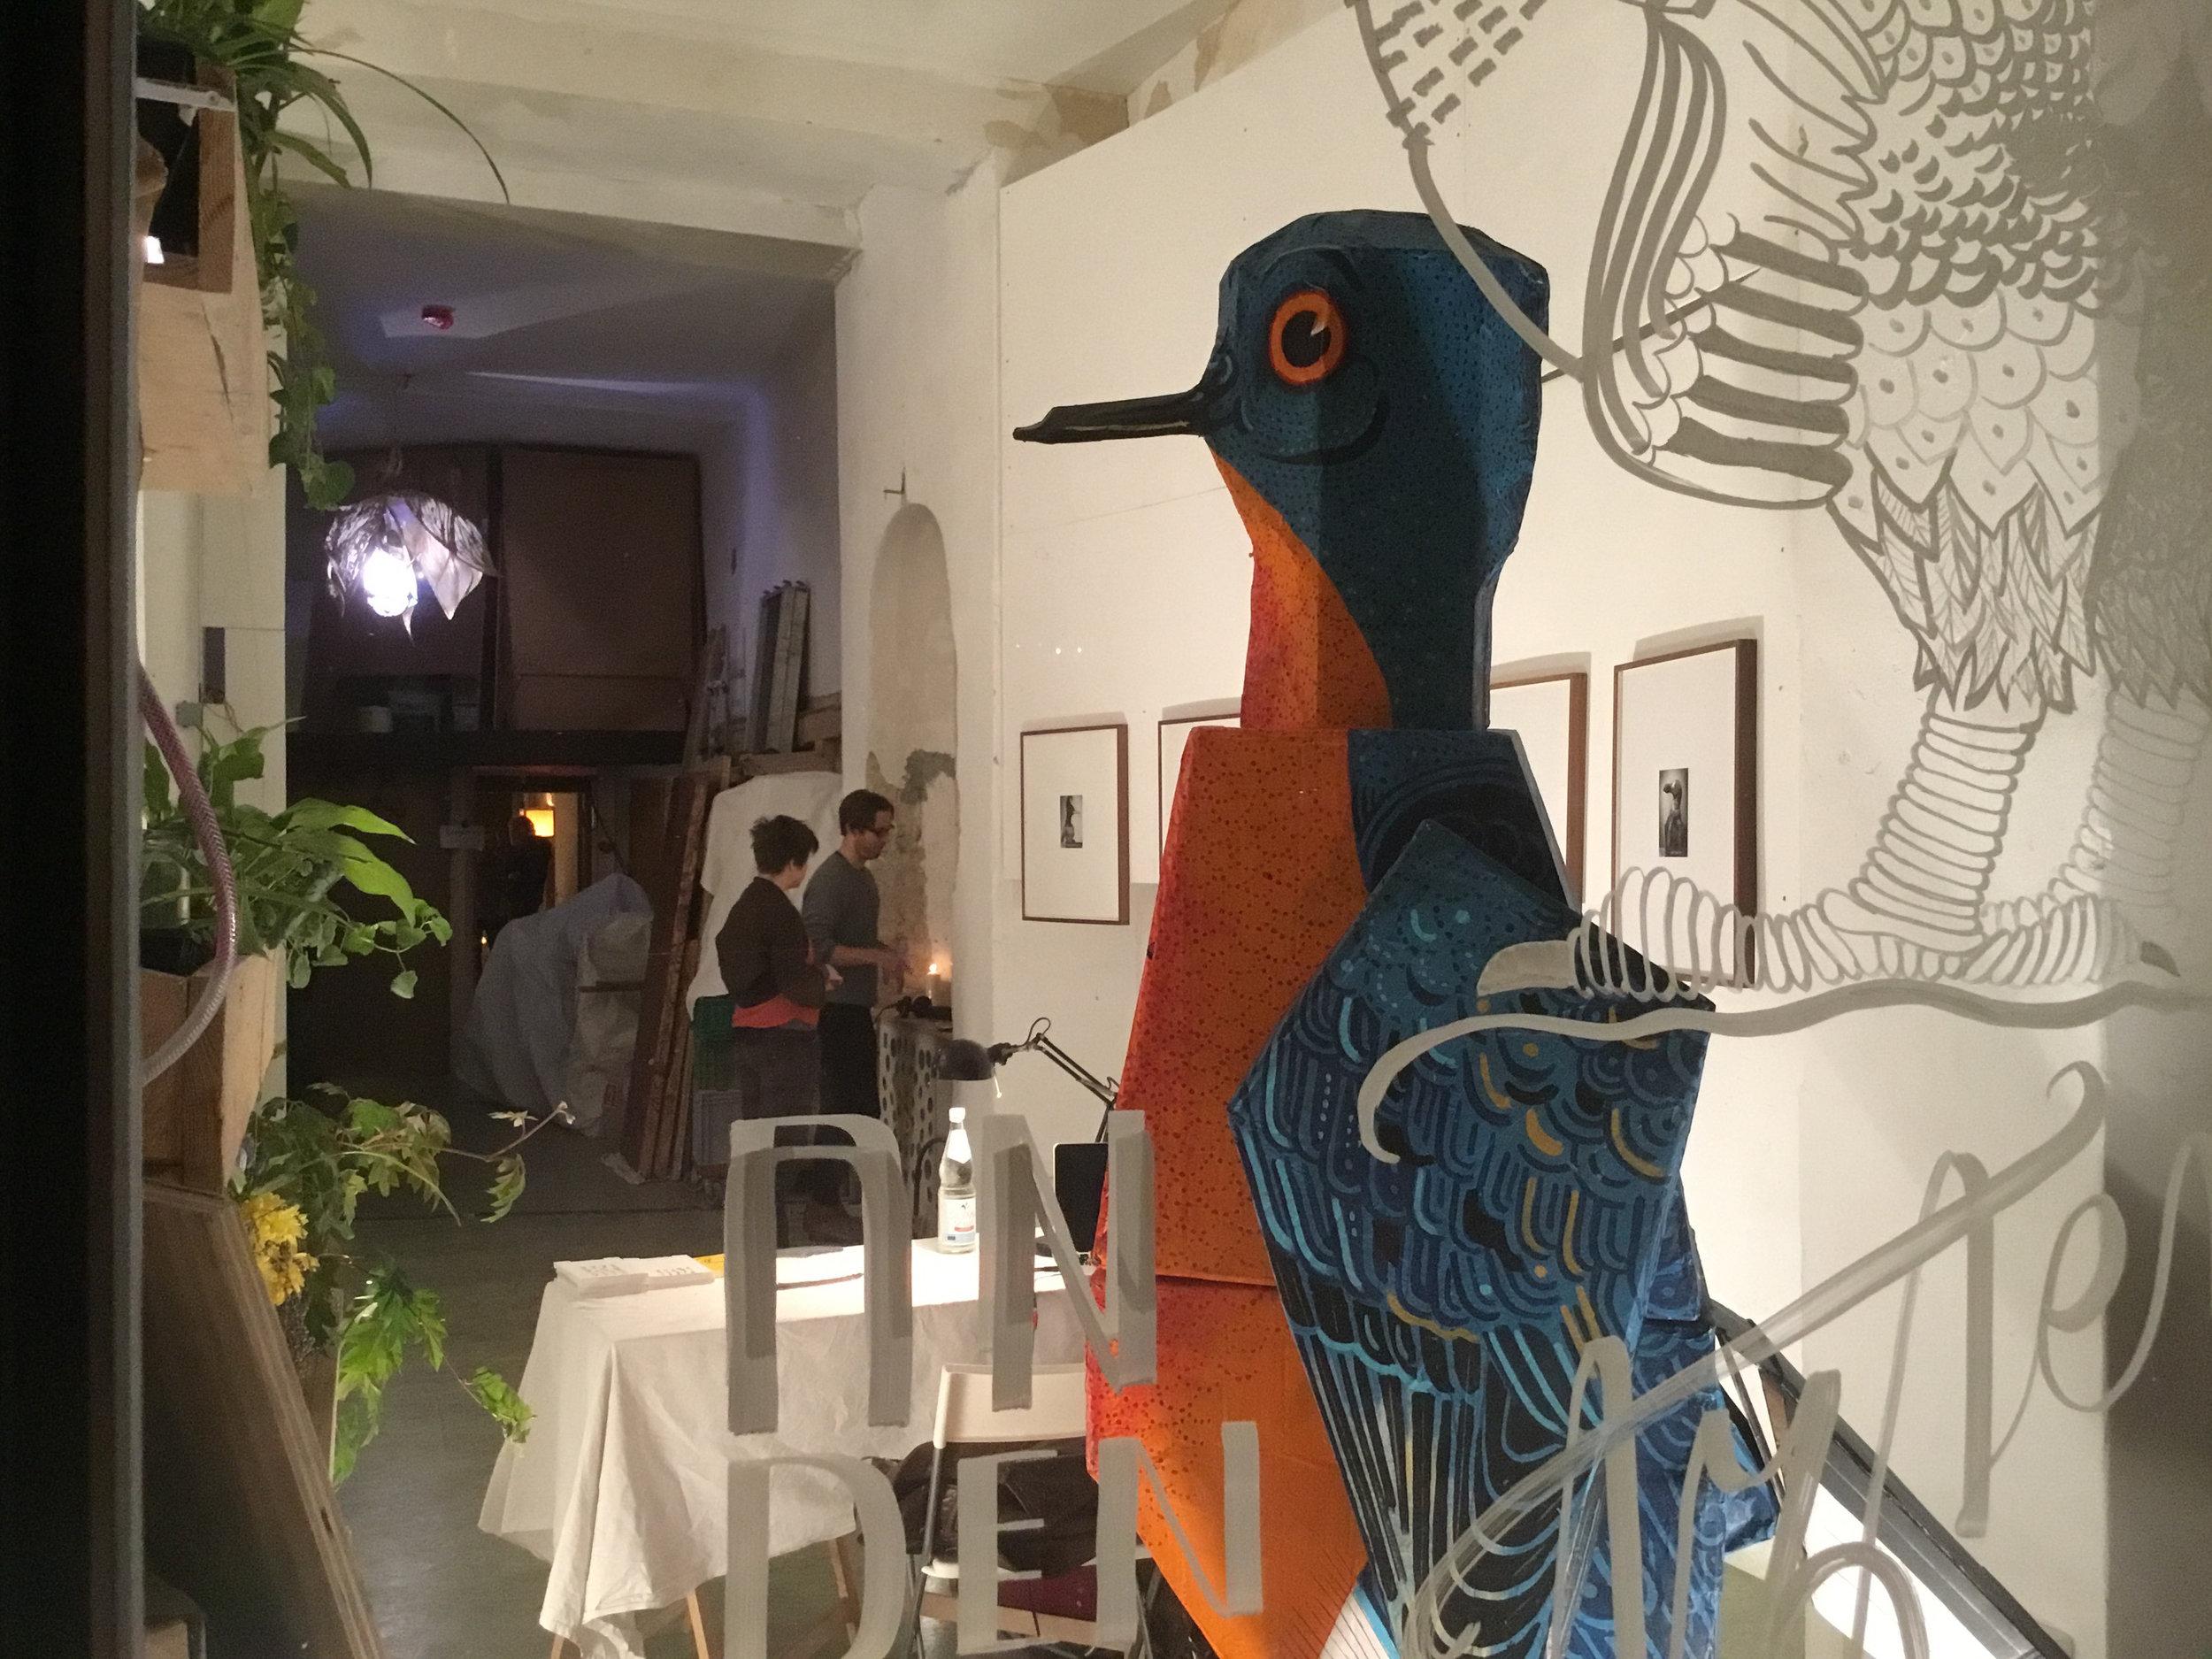 Sculpture Martha Bird by illustrator ATAK